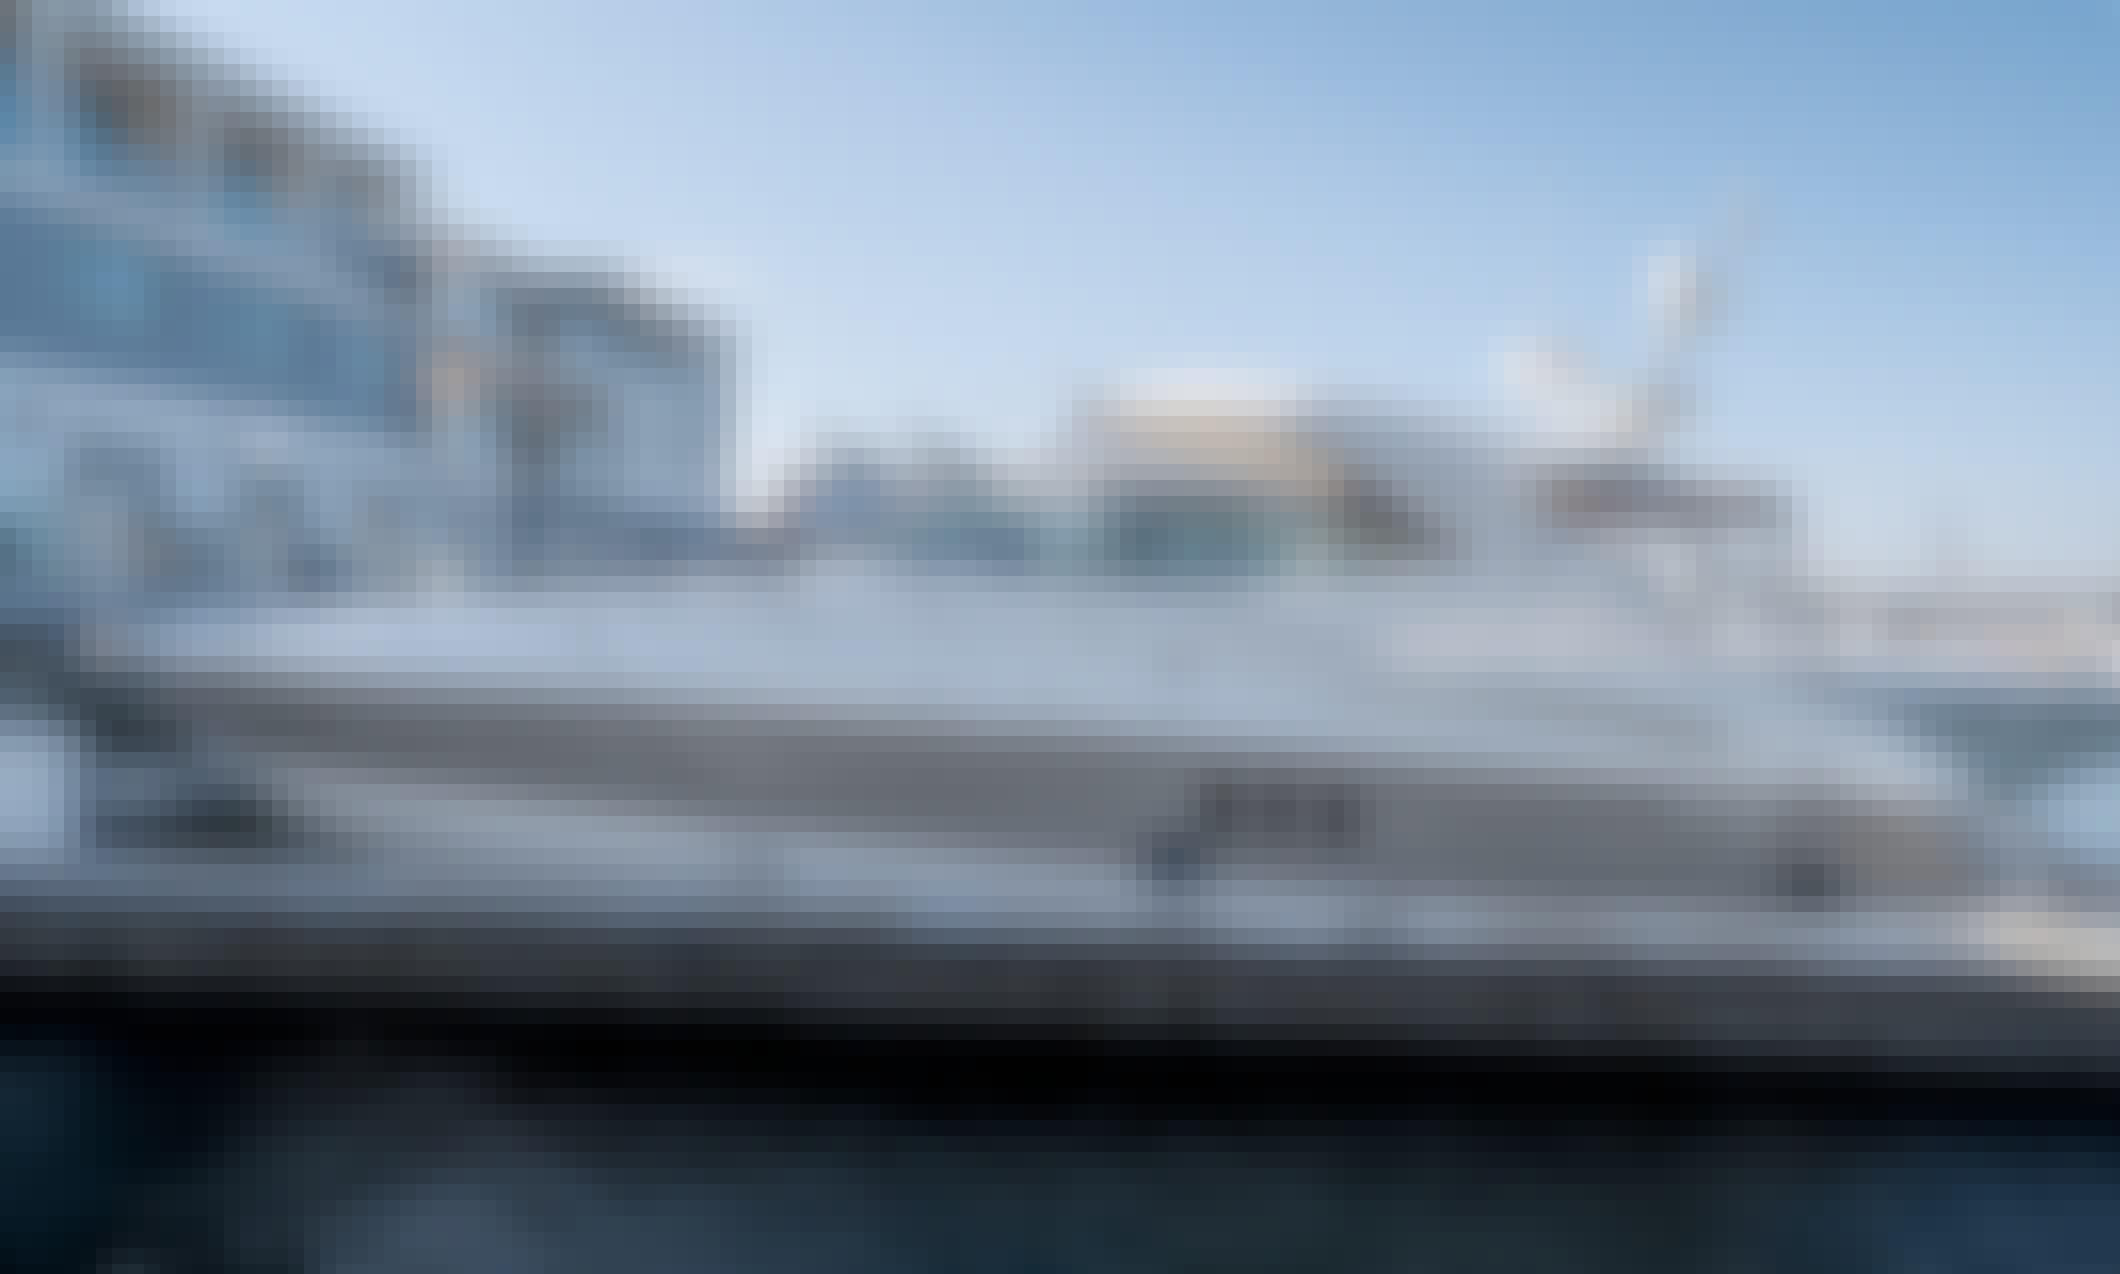 Yacht rental for 6 people in Newport Beach, CA